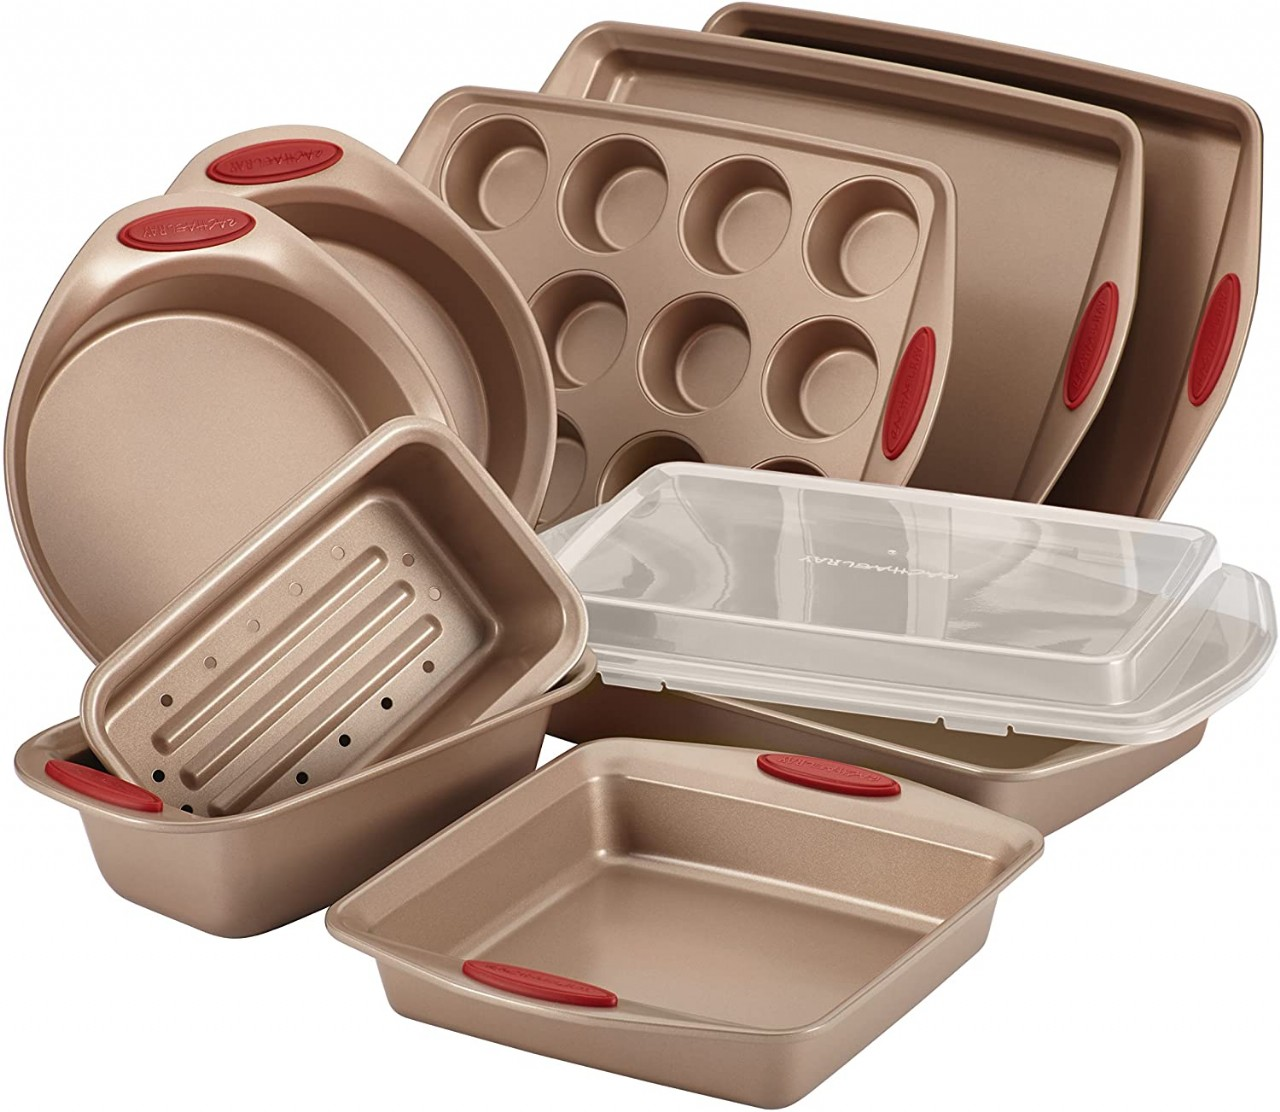 Rachael Ray 52410 Cucina Nonstick Bakeware Set with Baking Pans, Baking Sheets, Cookie Sheets, Cake